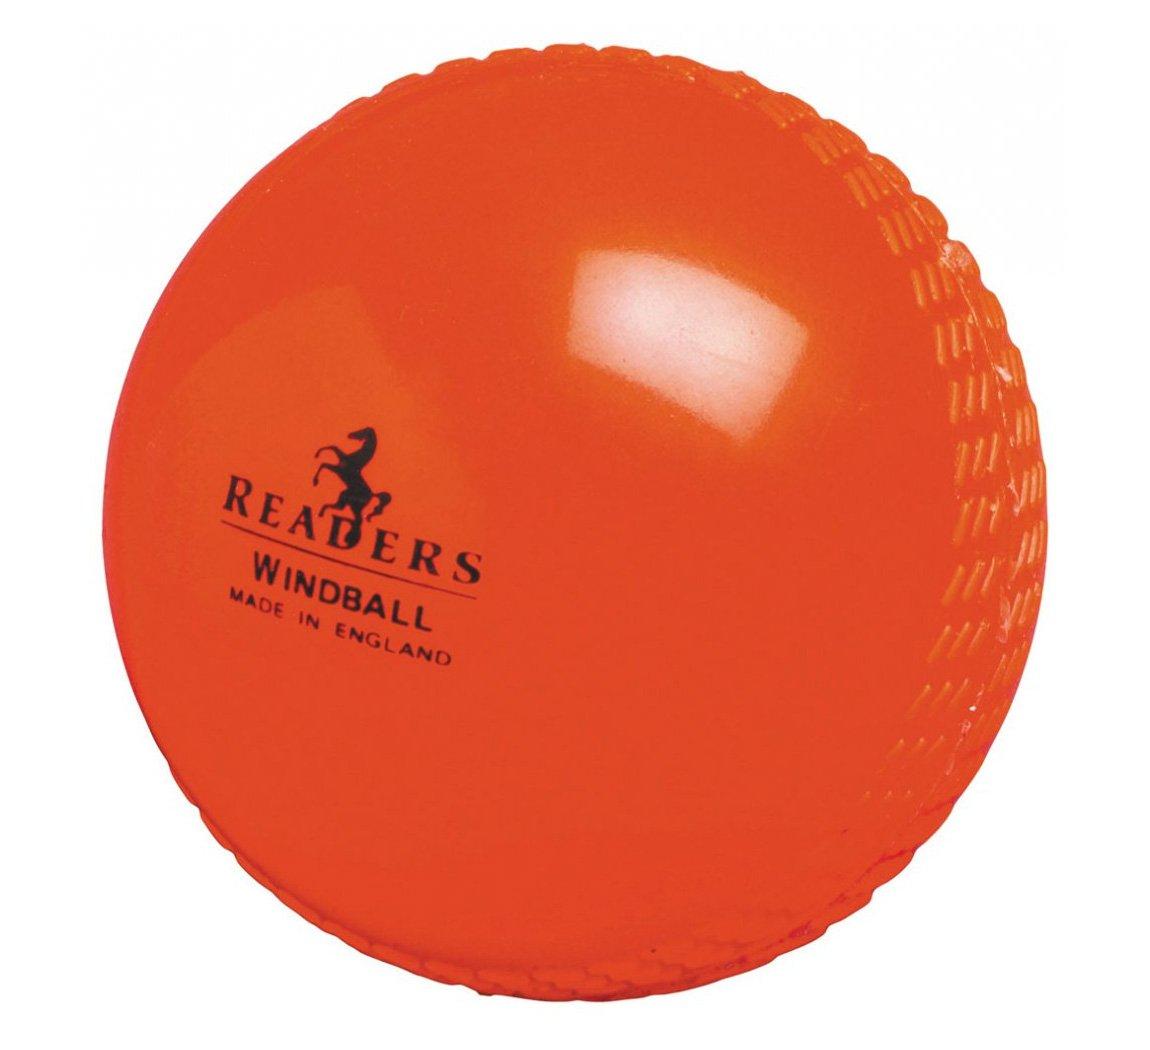 Readers Windball Cricketball